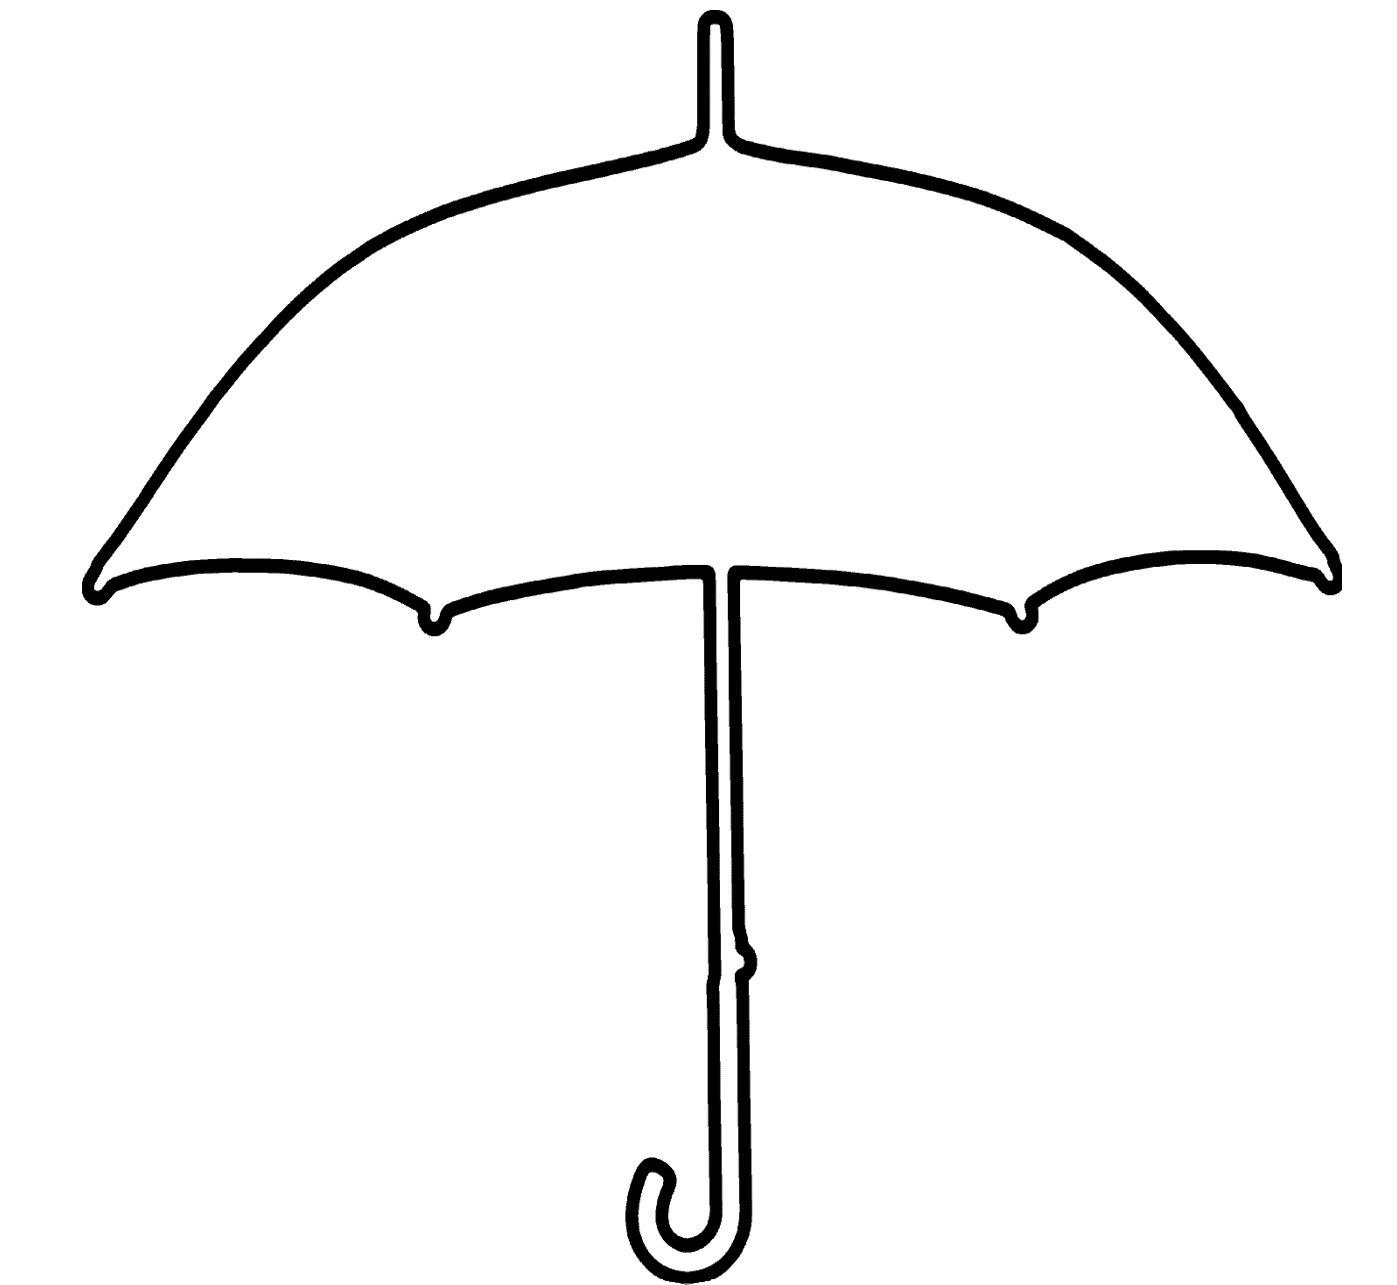 Smoke   Clip Art also Printable Umbrella Template For Preschool together with Empresa Negocio Hombre Debajo Paraguas 10605172 besides Jiminy Cricket Coloring Pages furthermore Wedding Bells Icon. on umbrella clip art